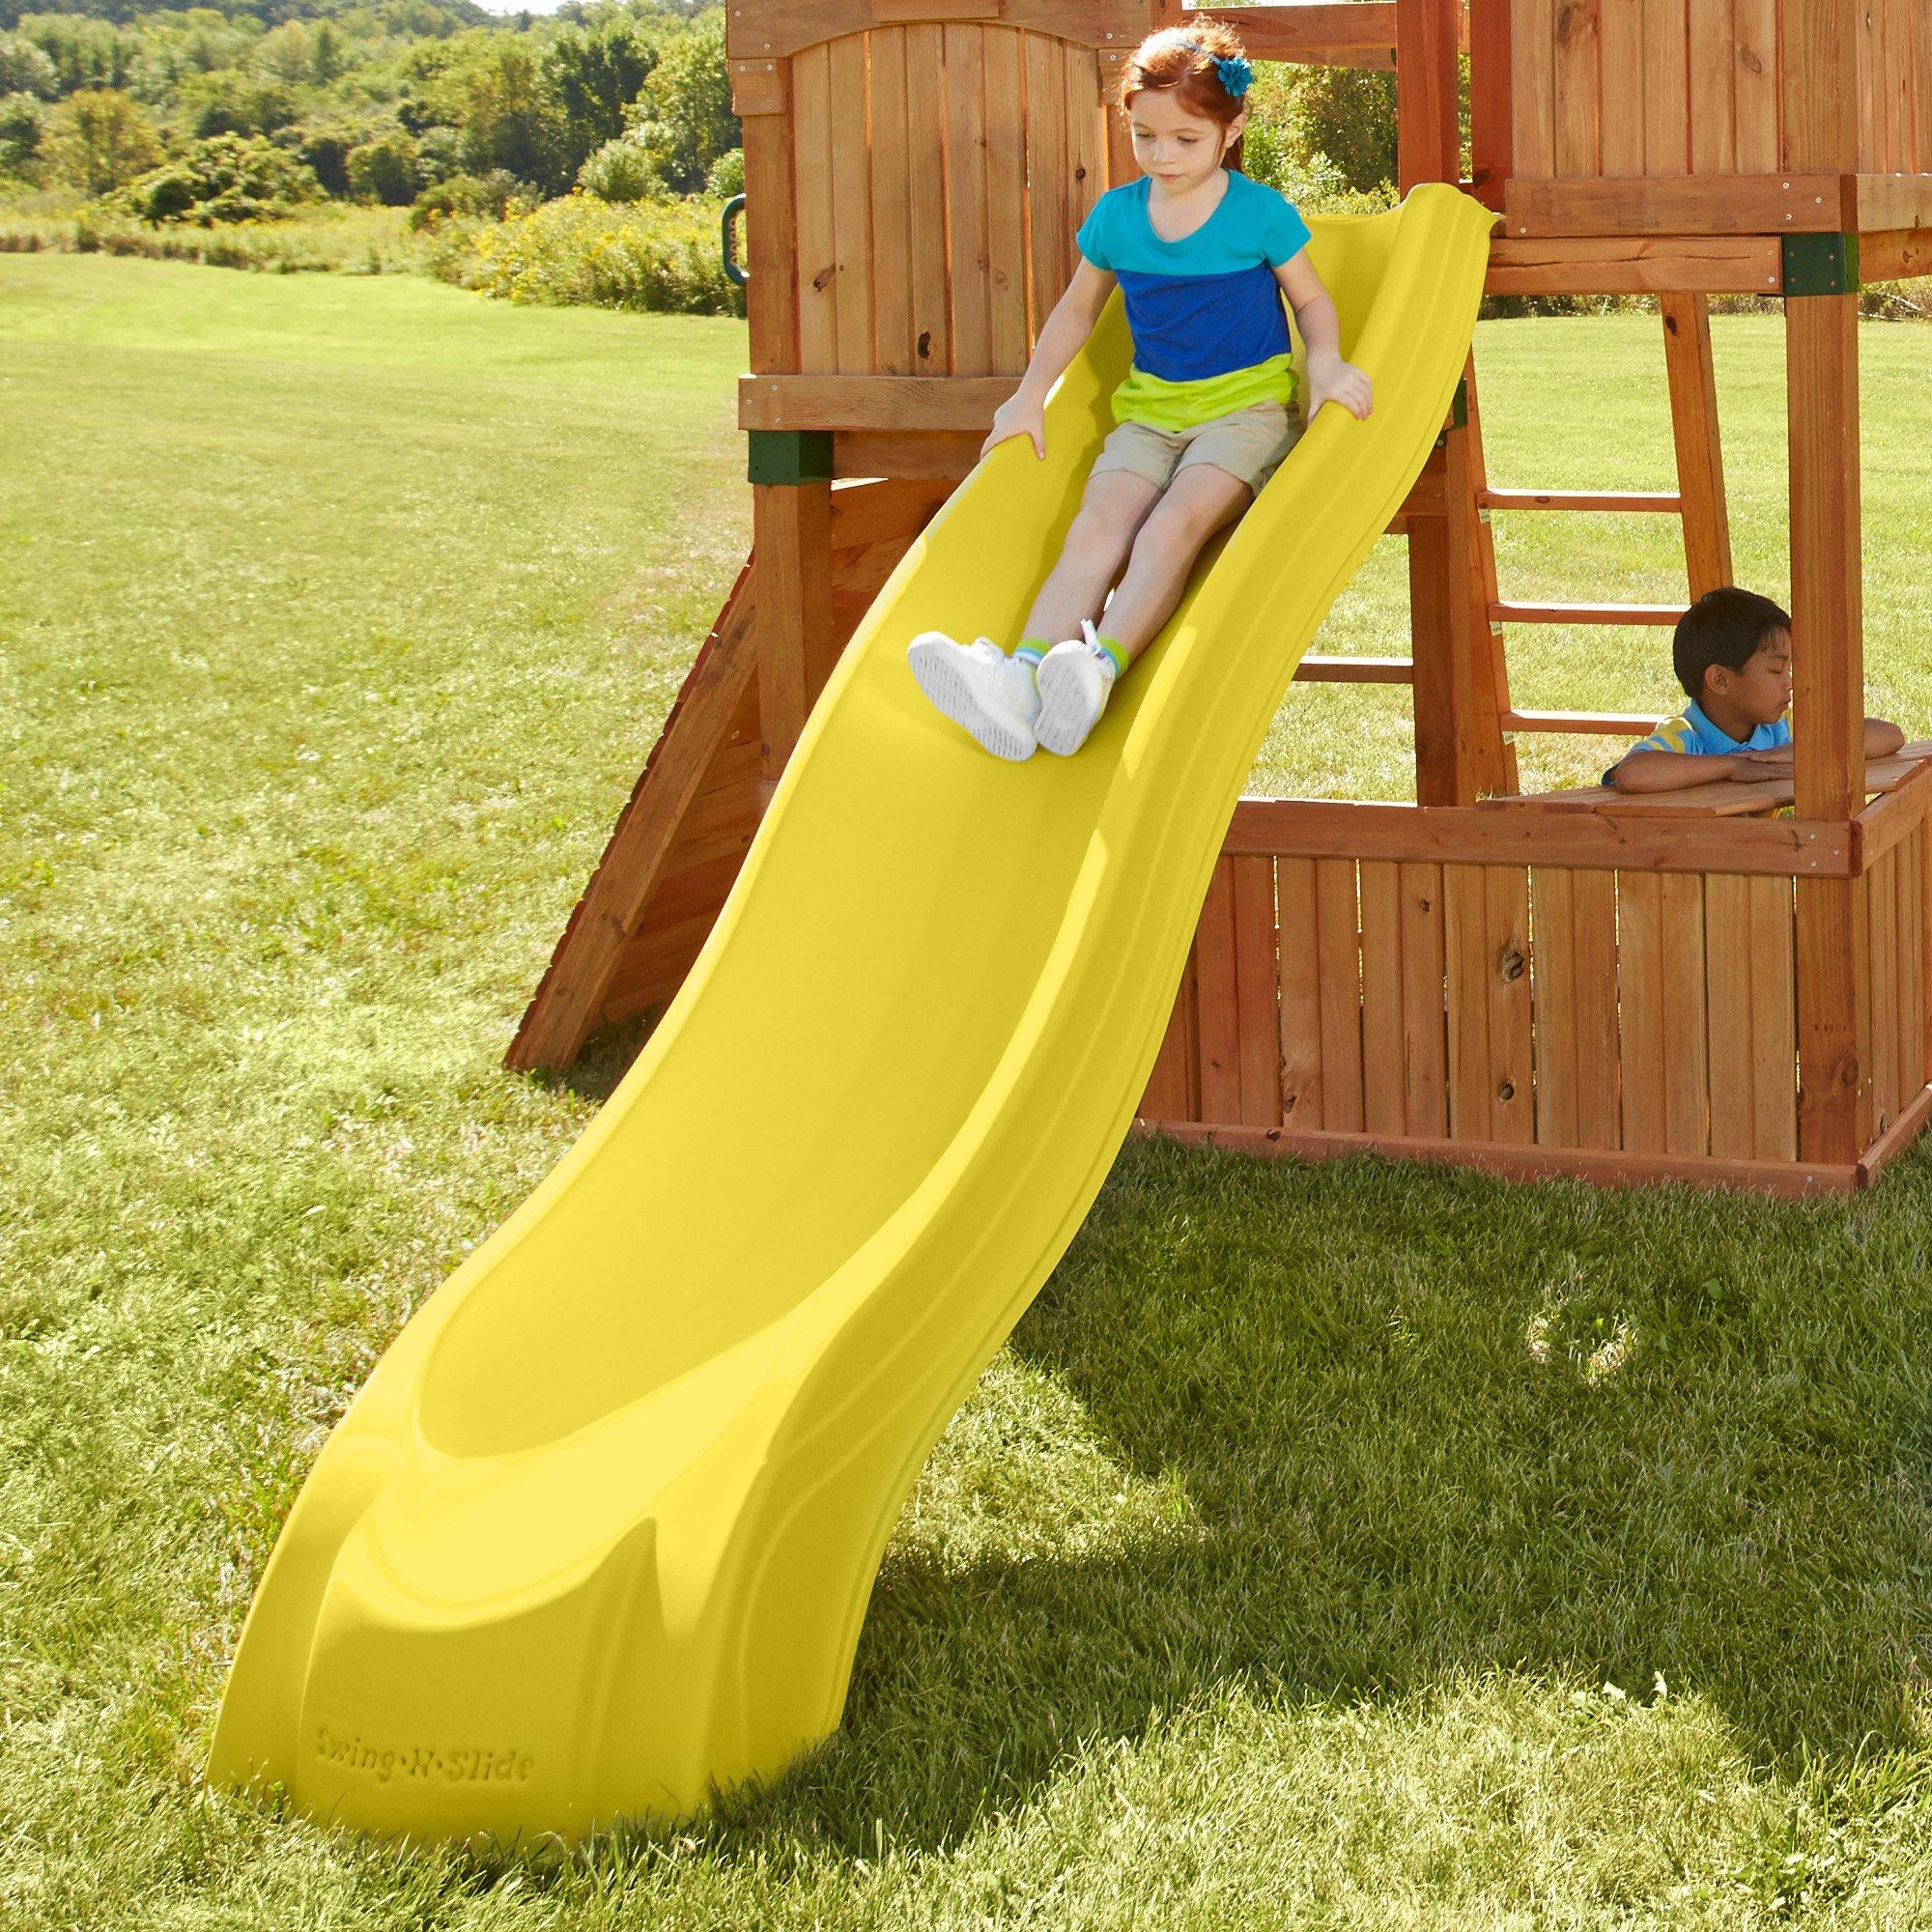 Alpine Wave Slide, Yellow by Swing-N-Slide (Image #2)